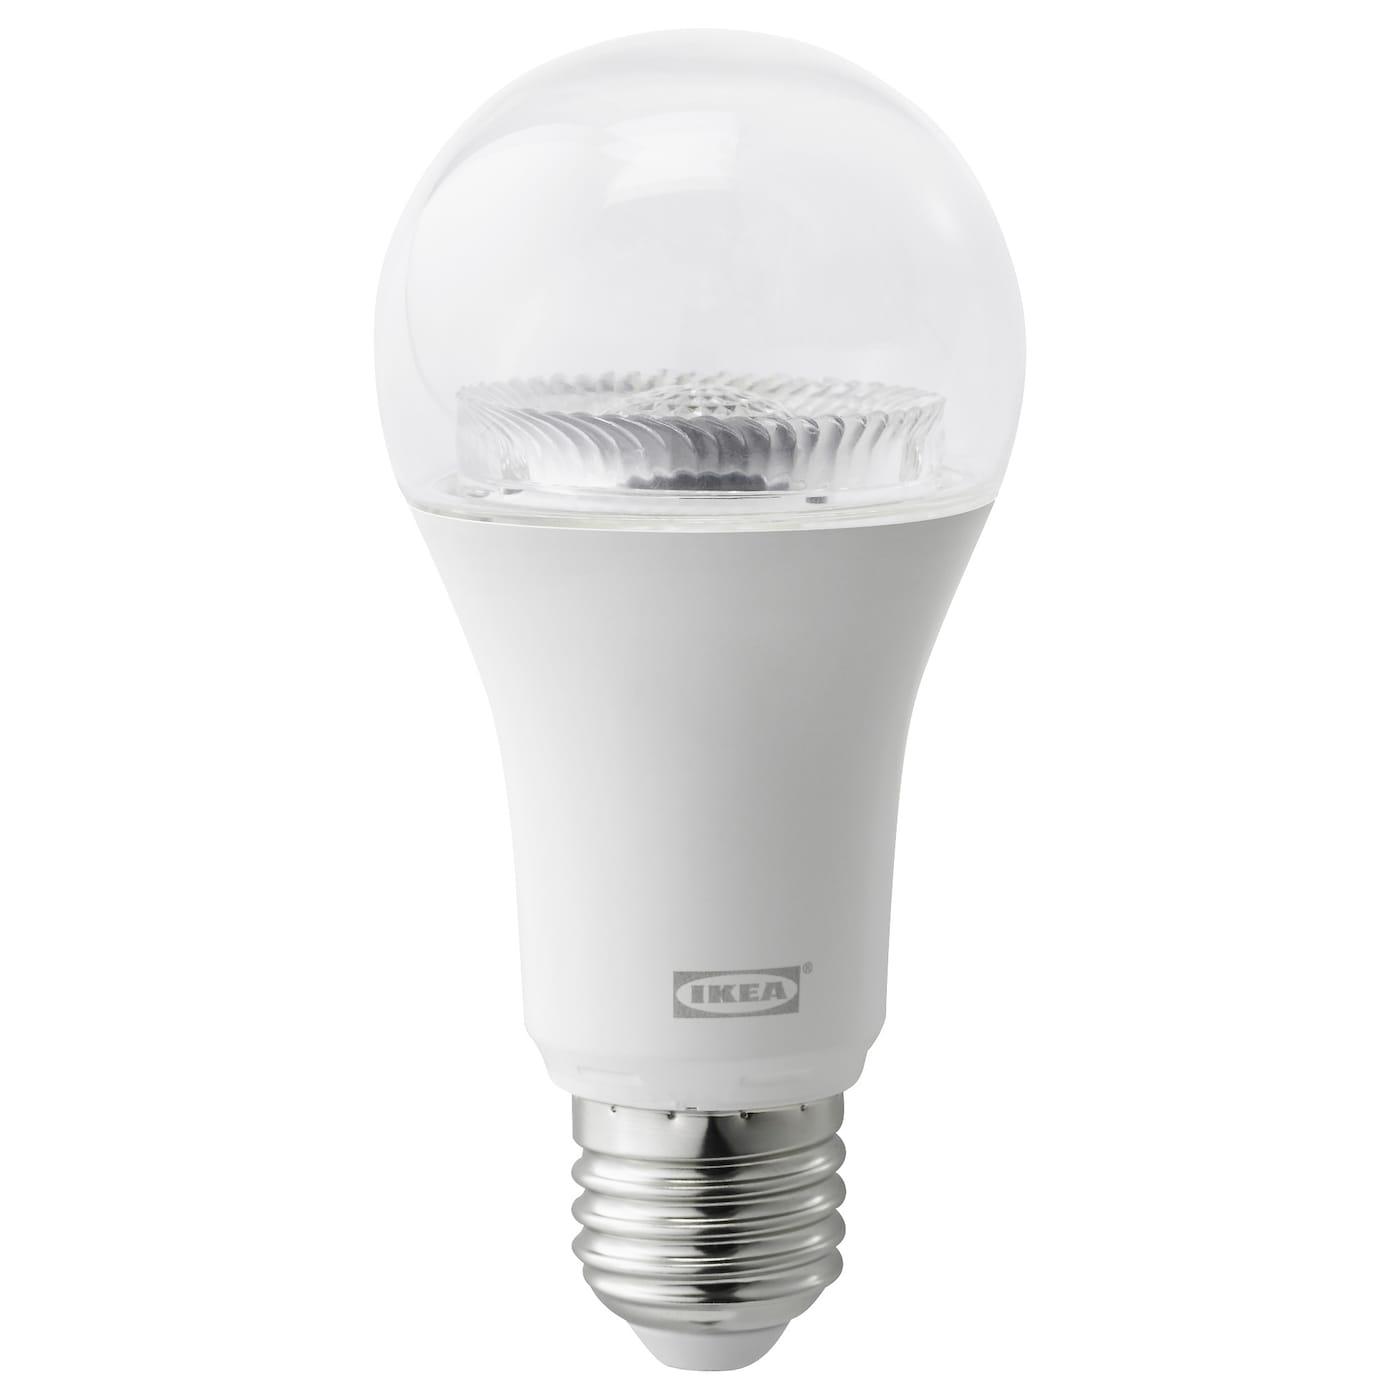 tr dfri led bulb e27 950 lumen wireless dimmable white spectrum clear ikea. Black Bedroom Furniture Sets. Home Design Ideas